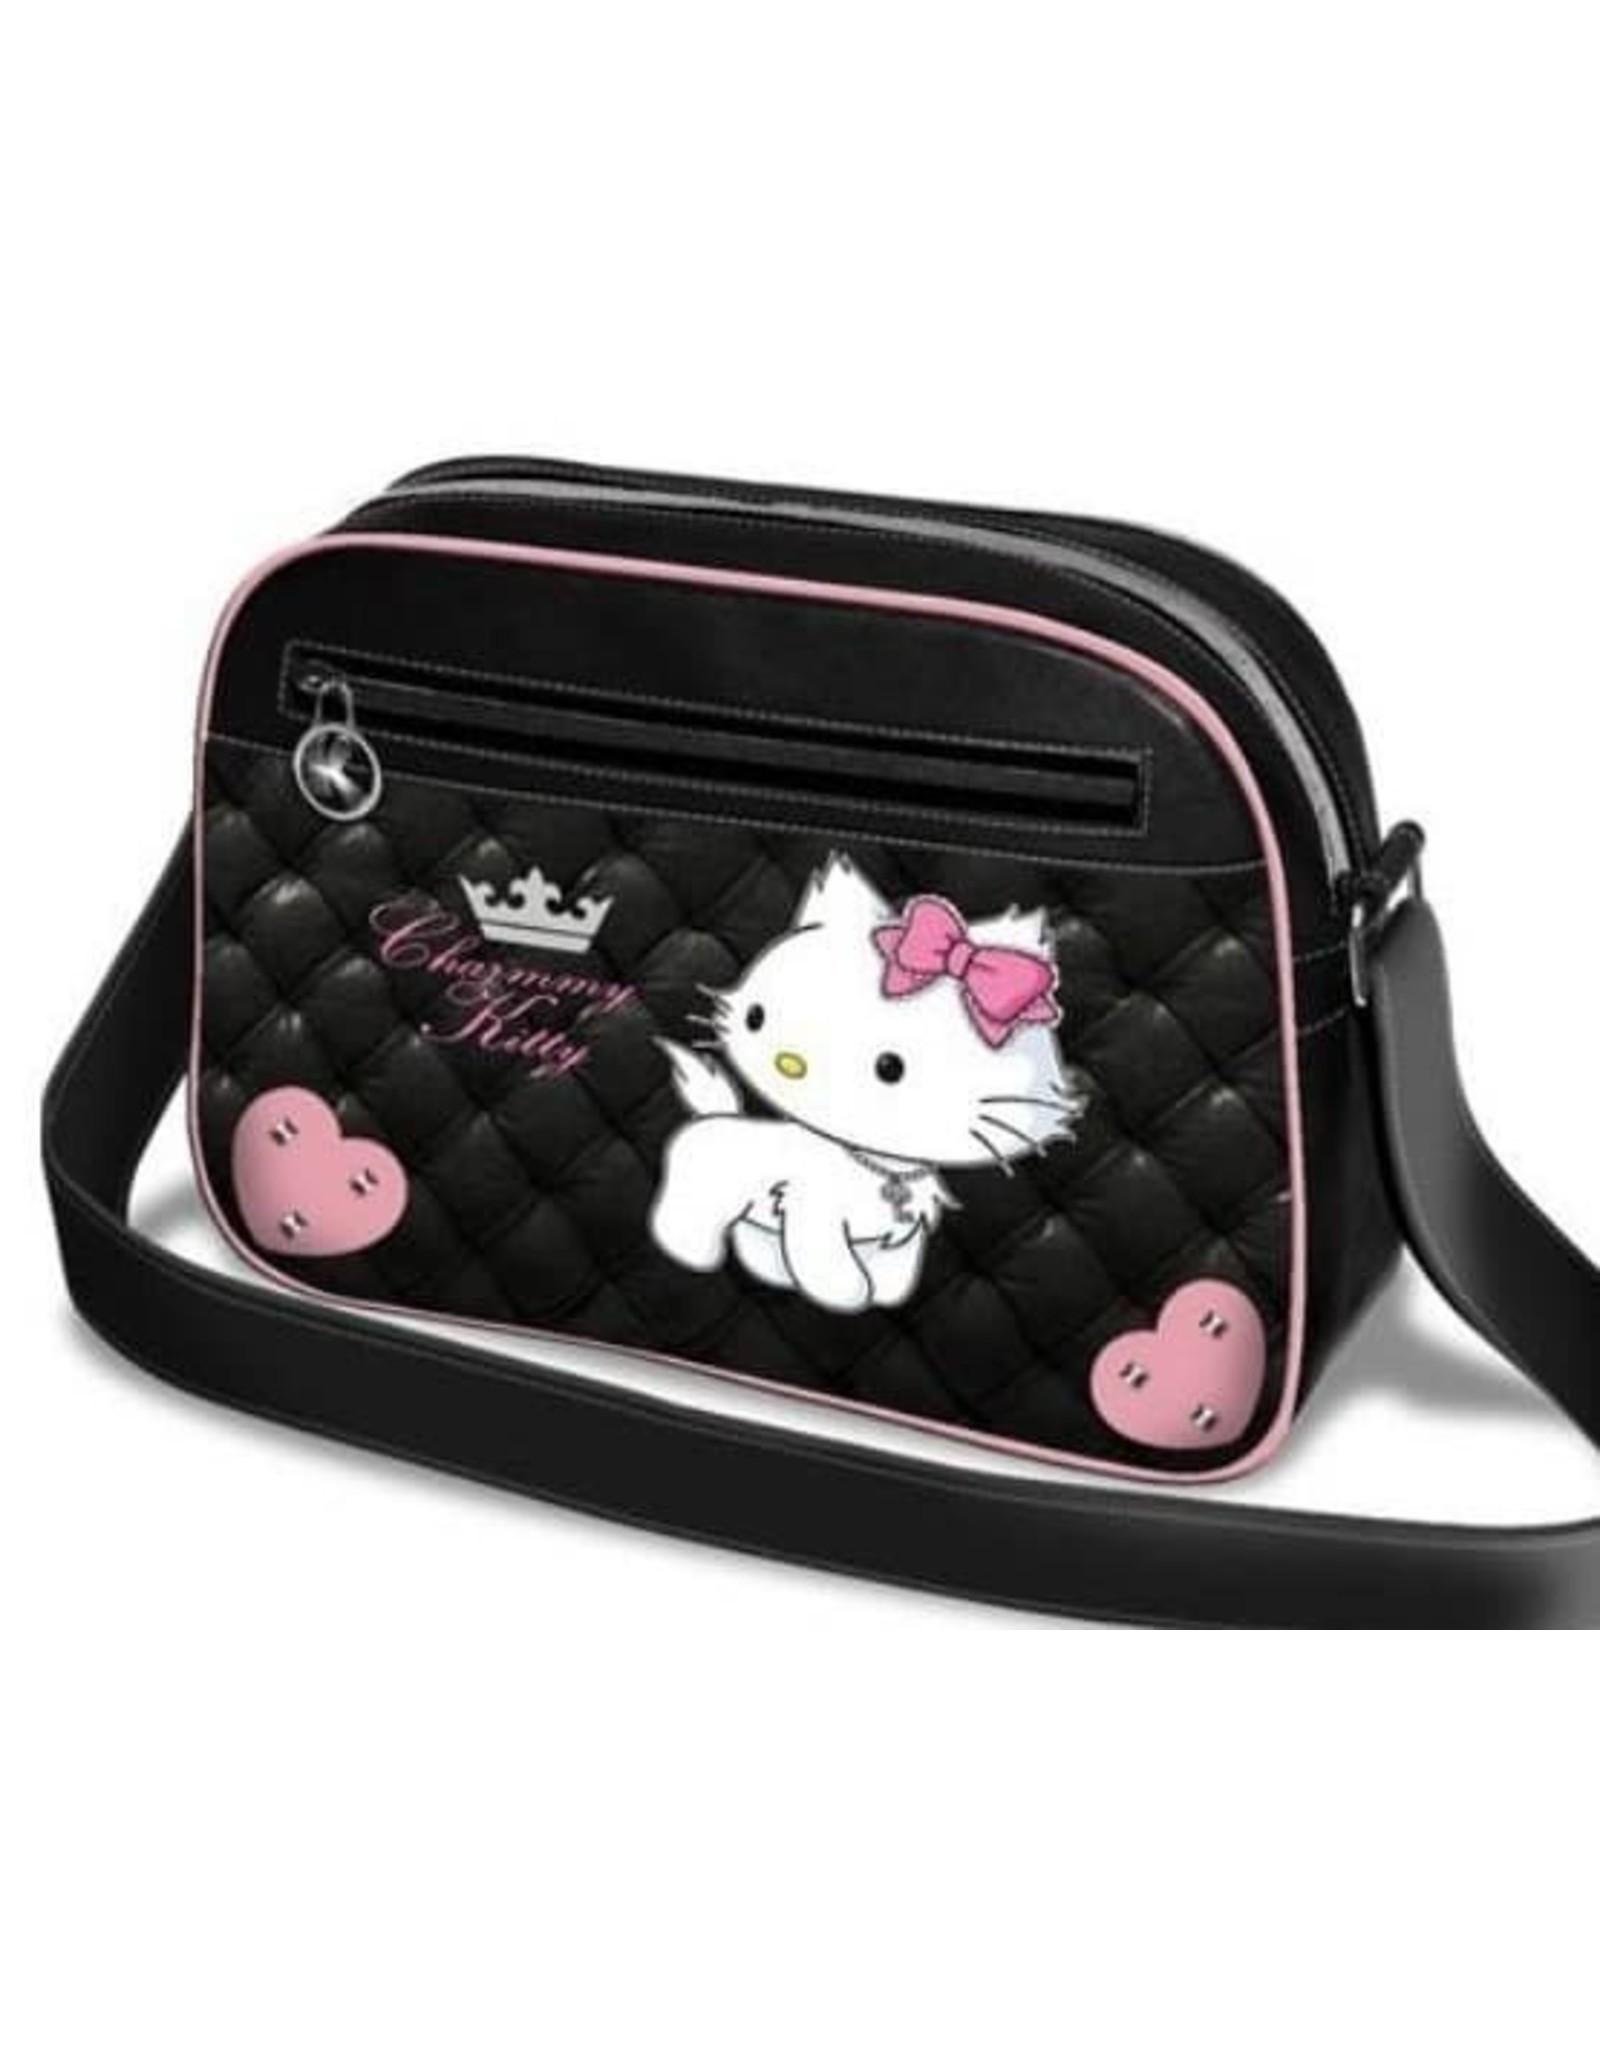 Charmmy Kitty Merchandise tassen - Charmmy Kitty schoudertas zwart